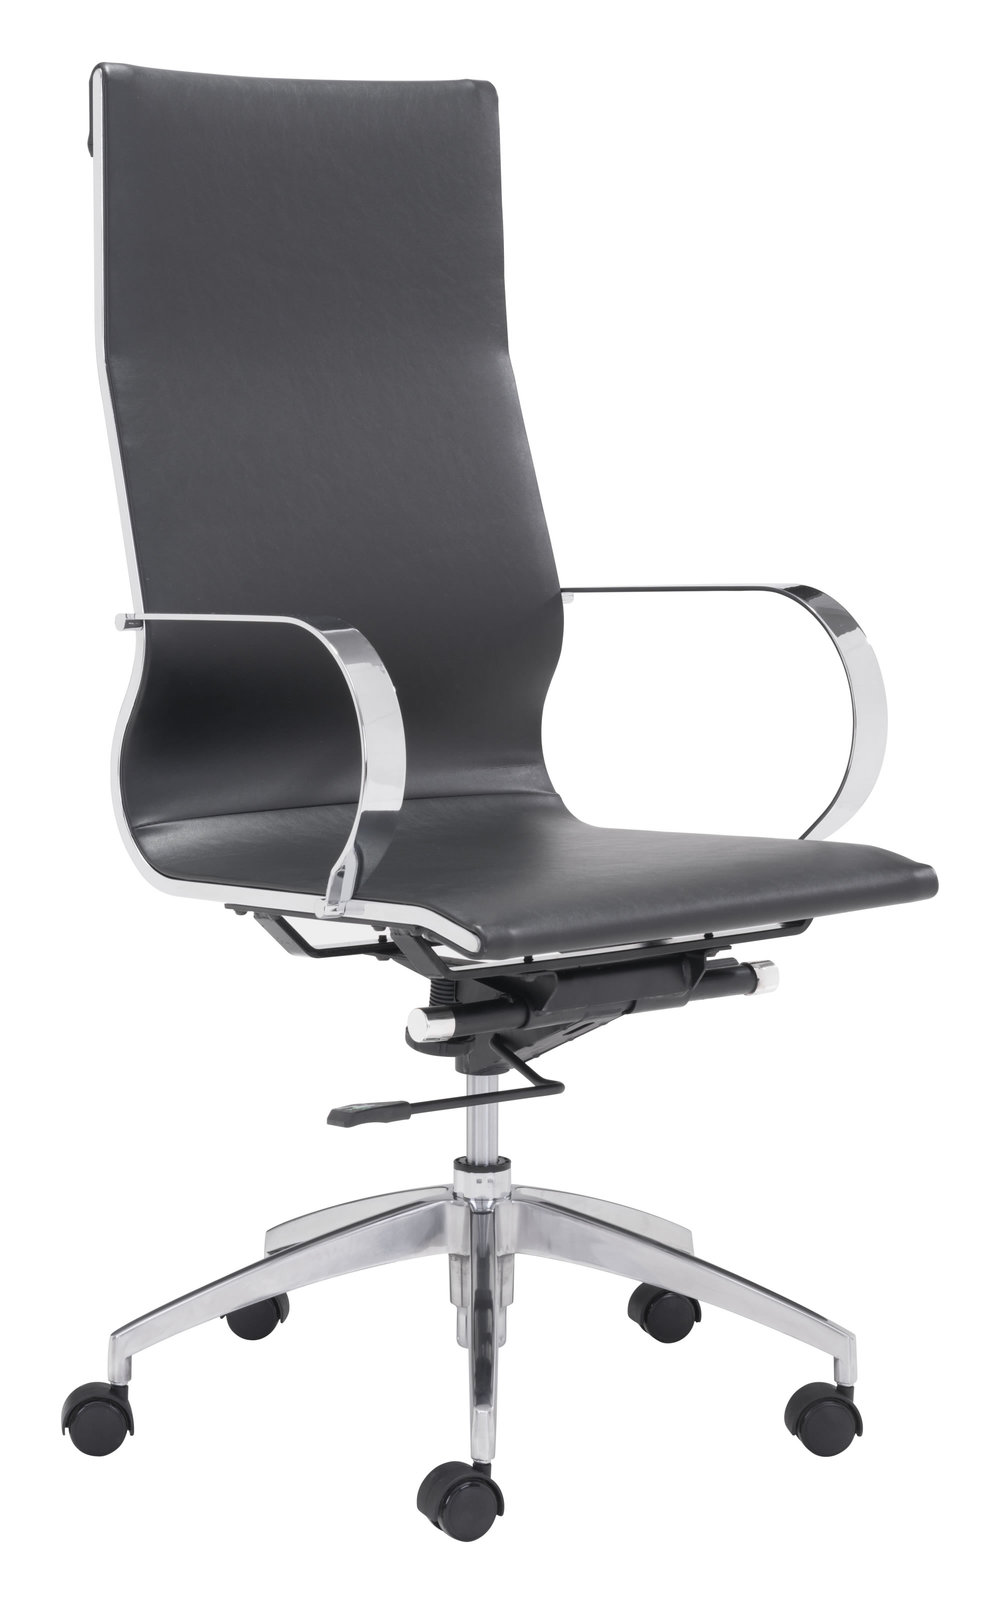 Zuo Modern Contemporary - Glider High Back Office Chair Black